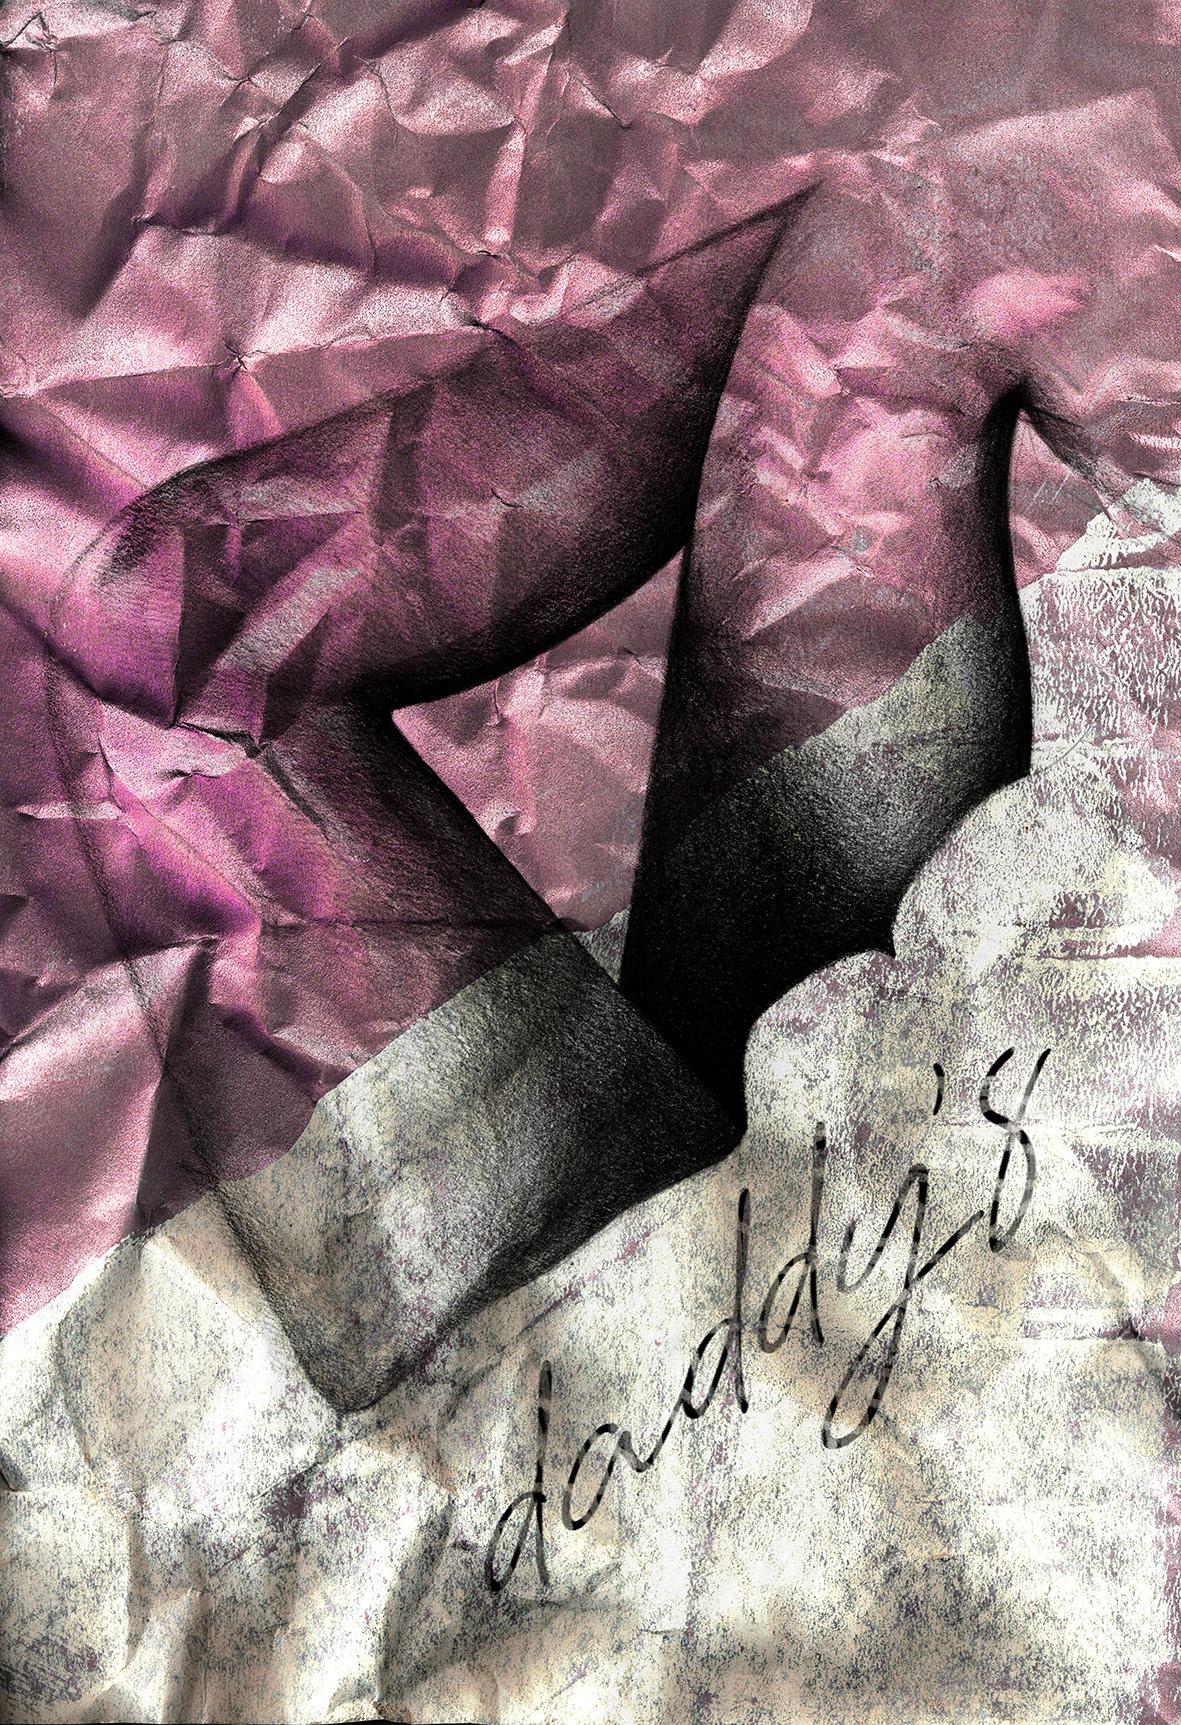 Image may contain: drawing, handwriting and painting